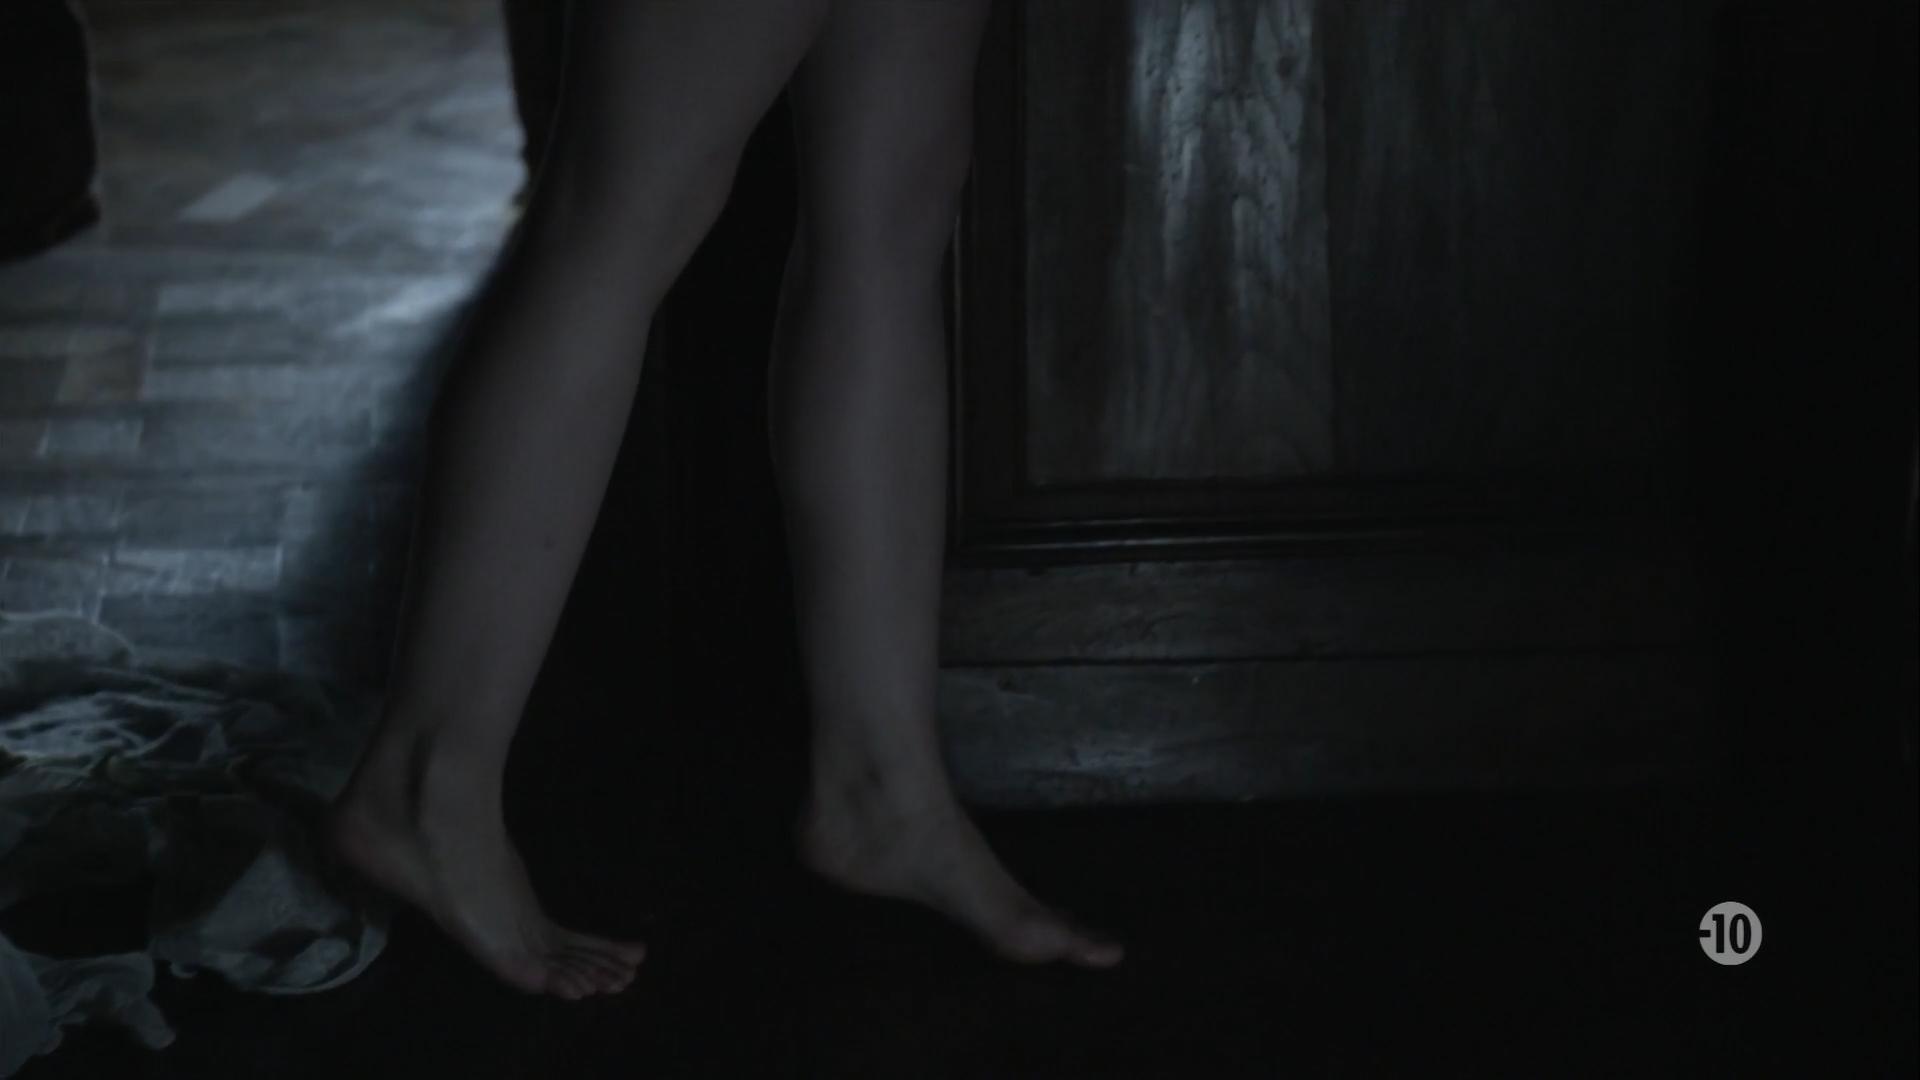 Norah Lehembre nudes (23 photos), Topless, Fappening, Instagram, panties 2015